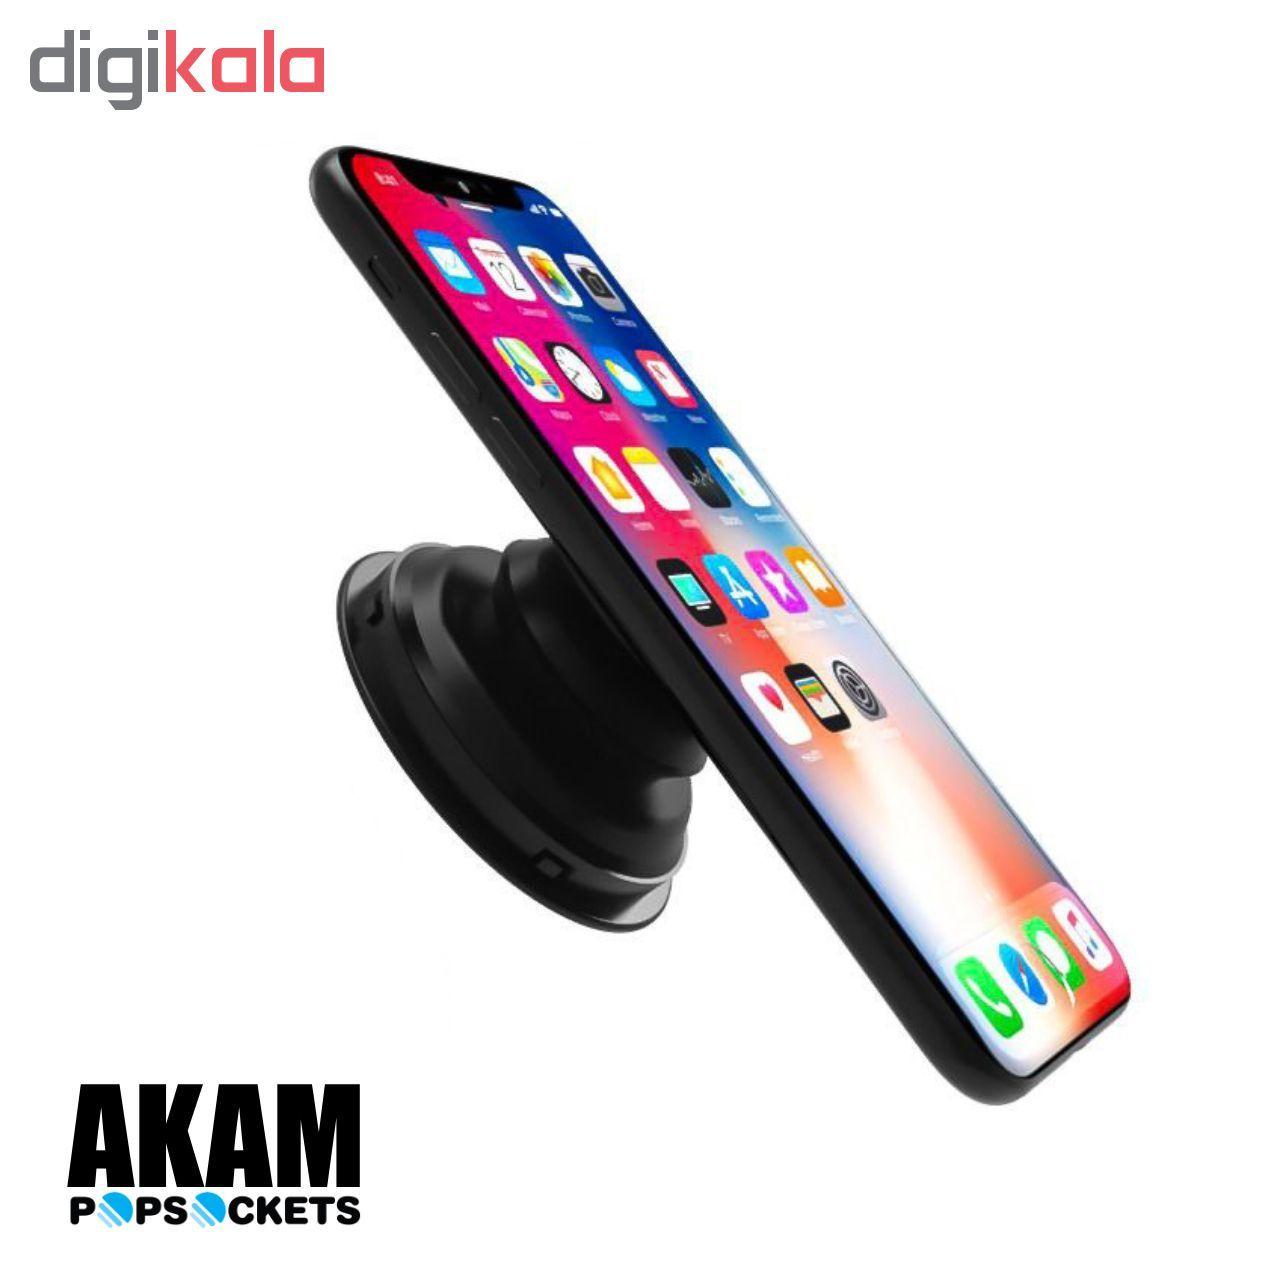 پایه نگهدارنده گوشی موبایل پاپ سوکت آکام مدل APS0161 main 1 6